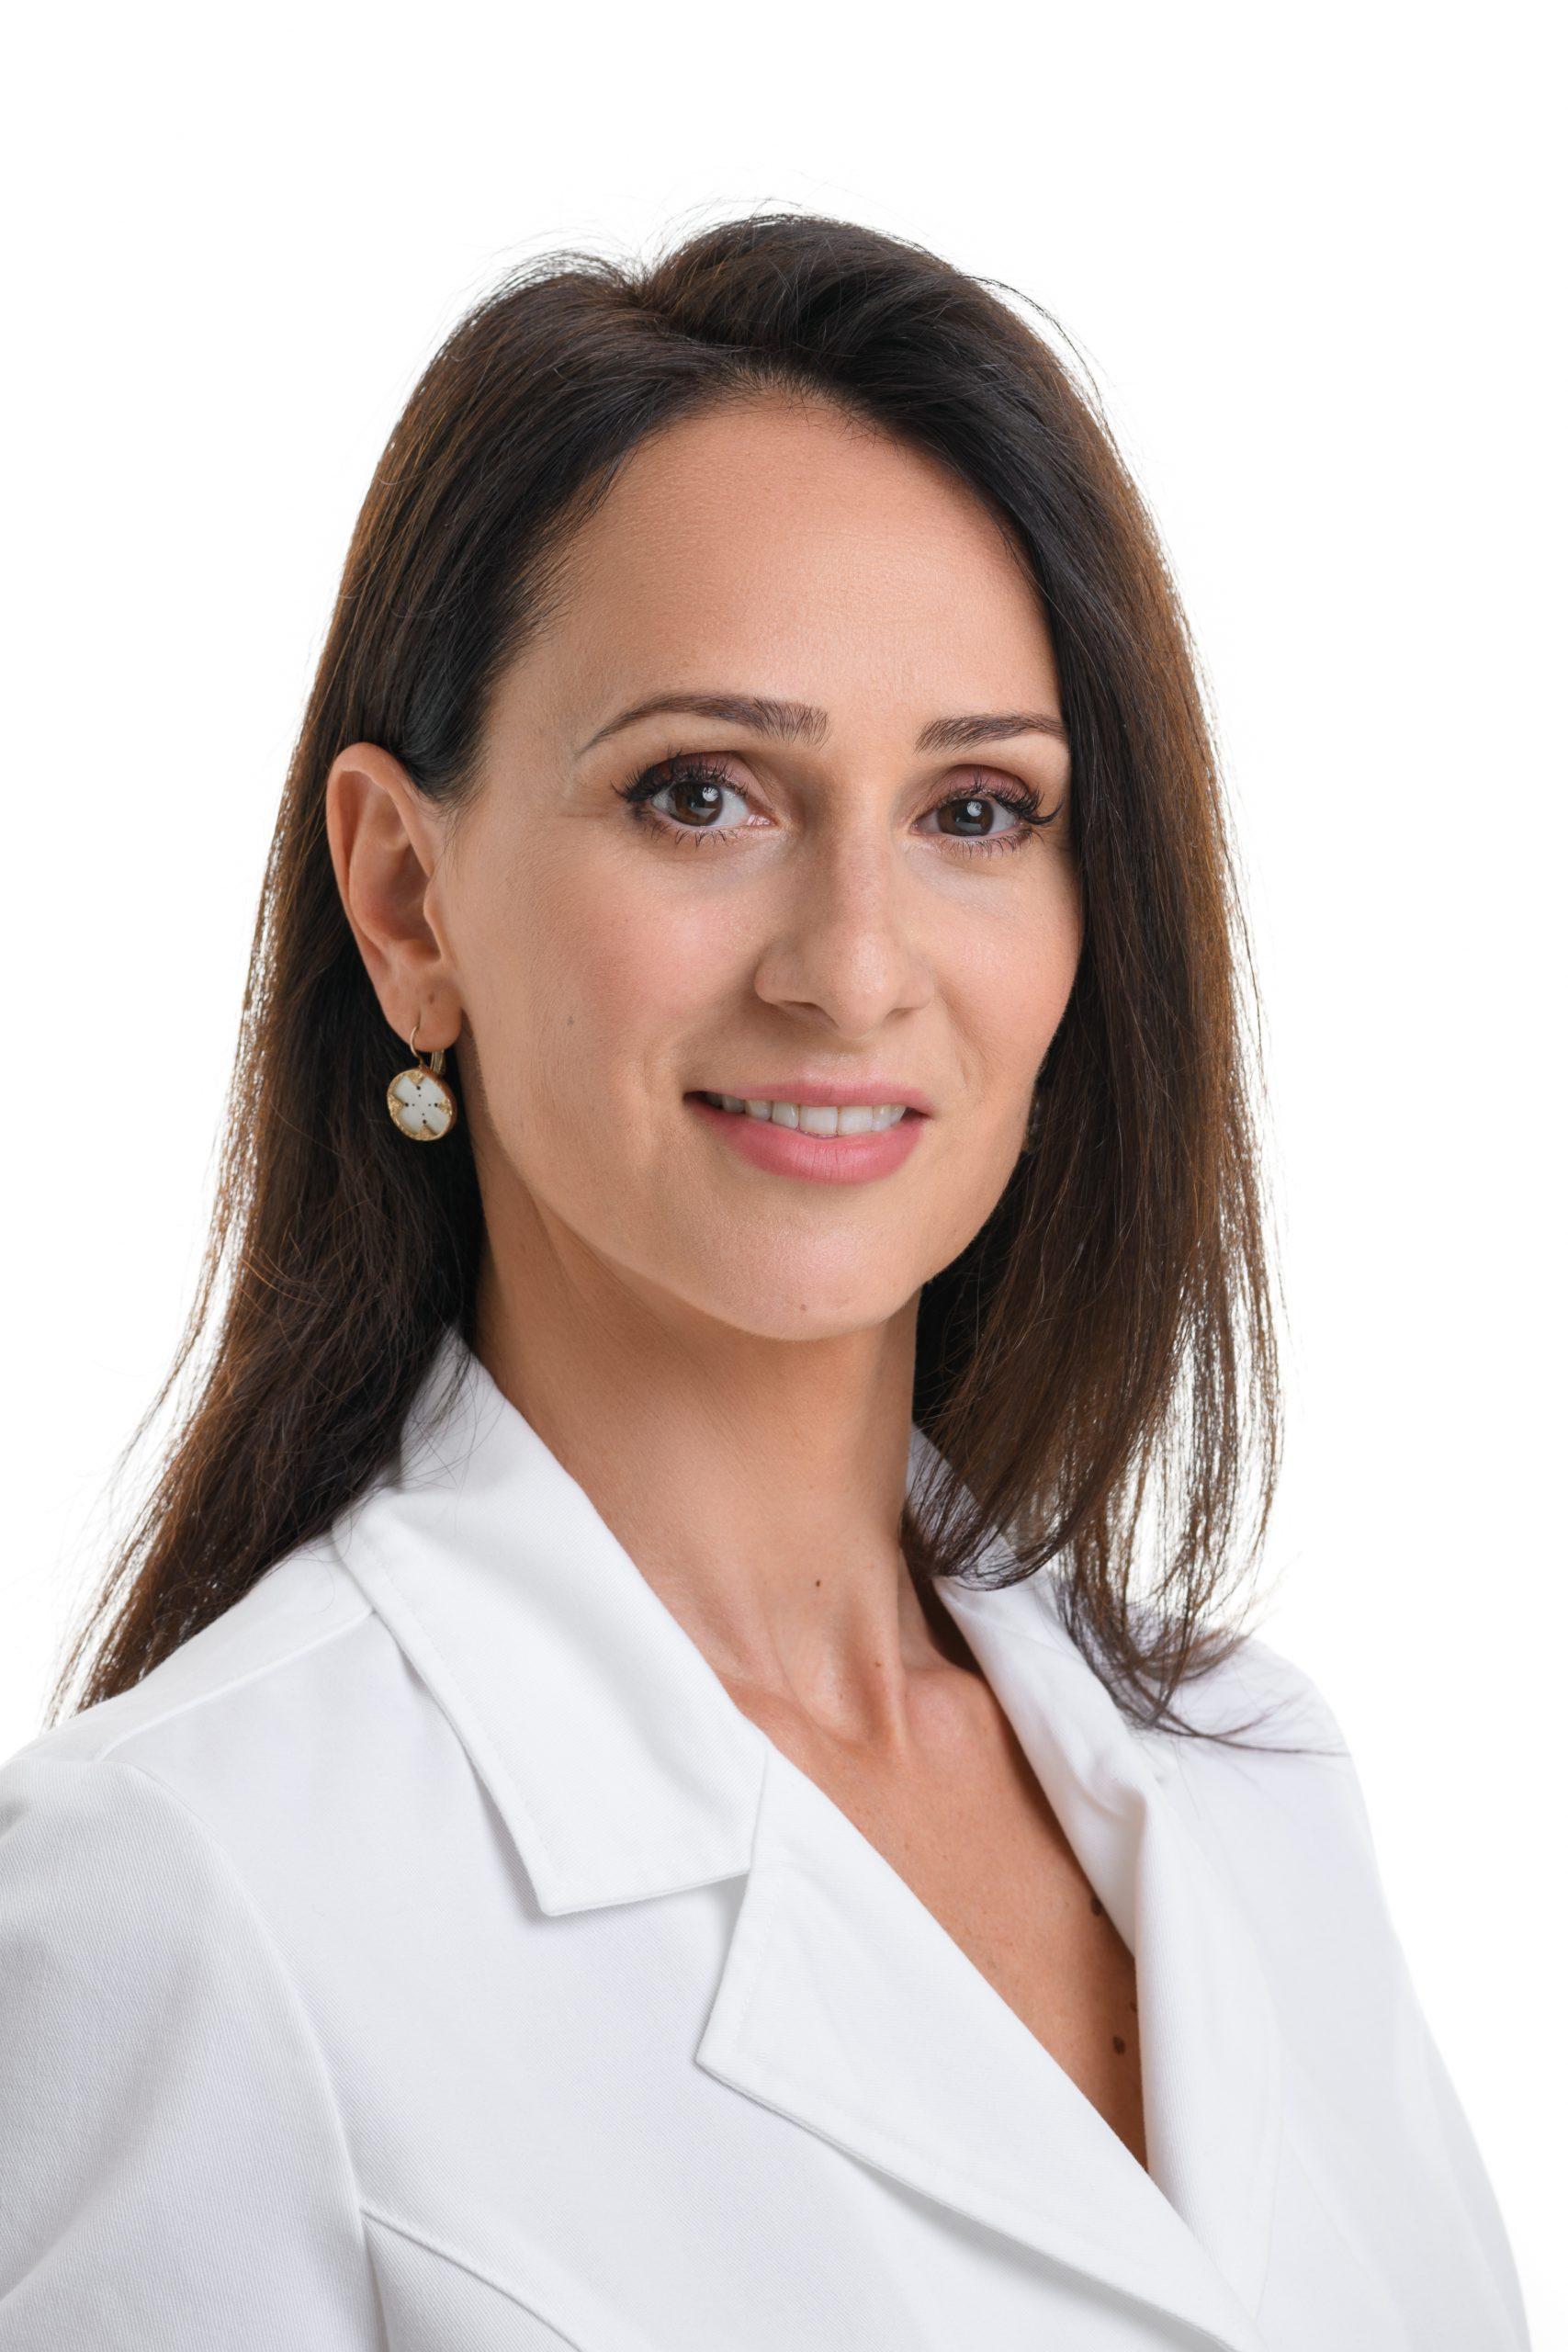 JUGANARU Maria Nicoleta